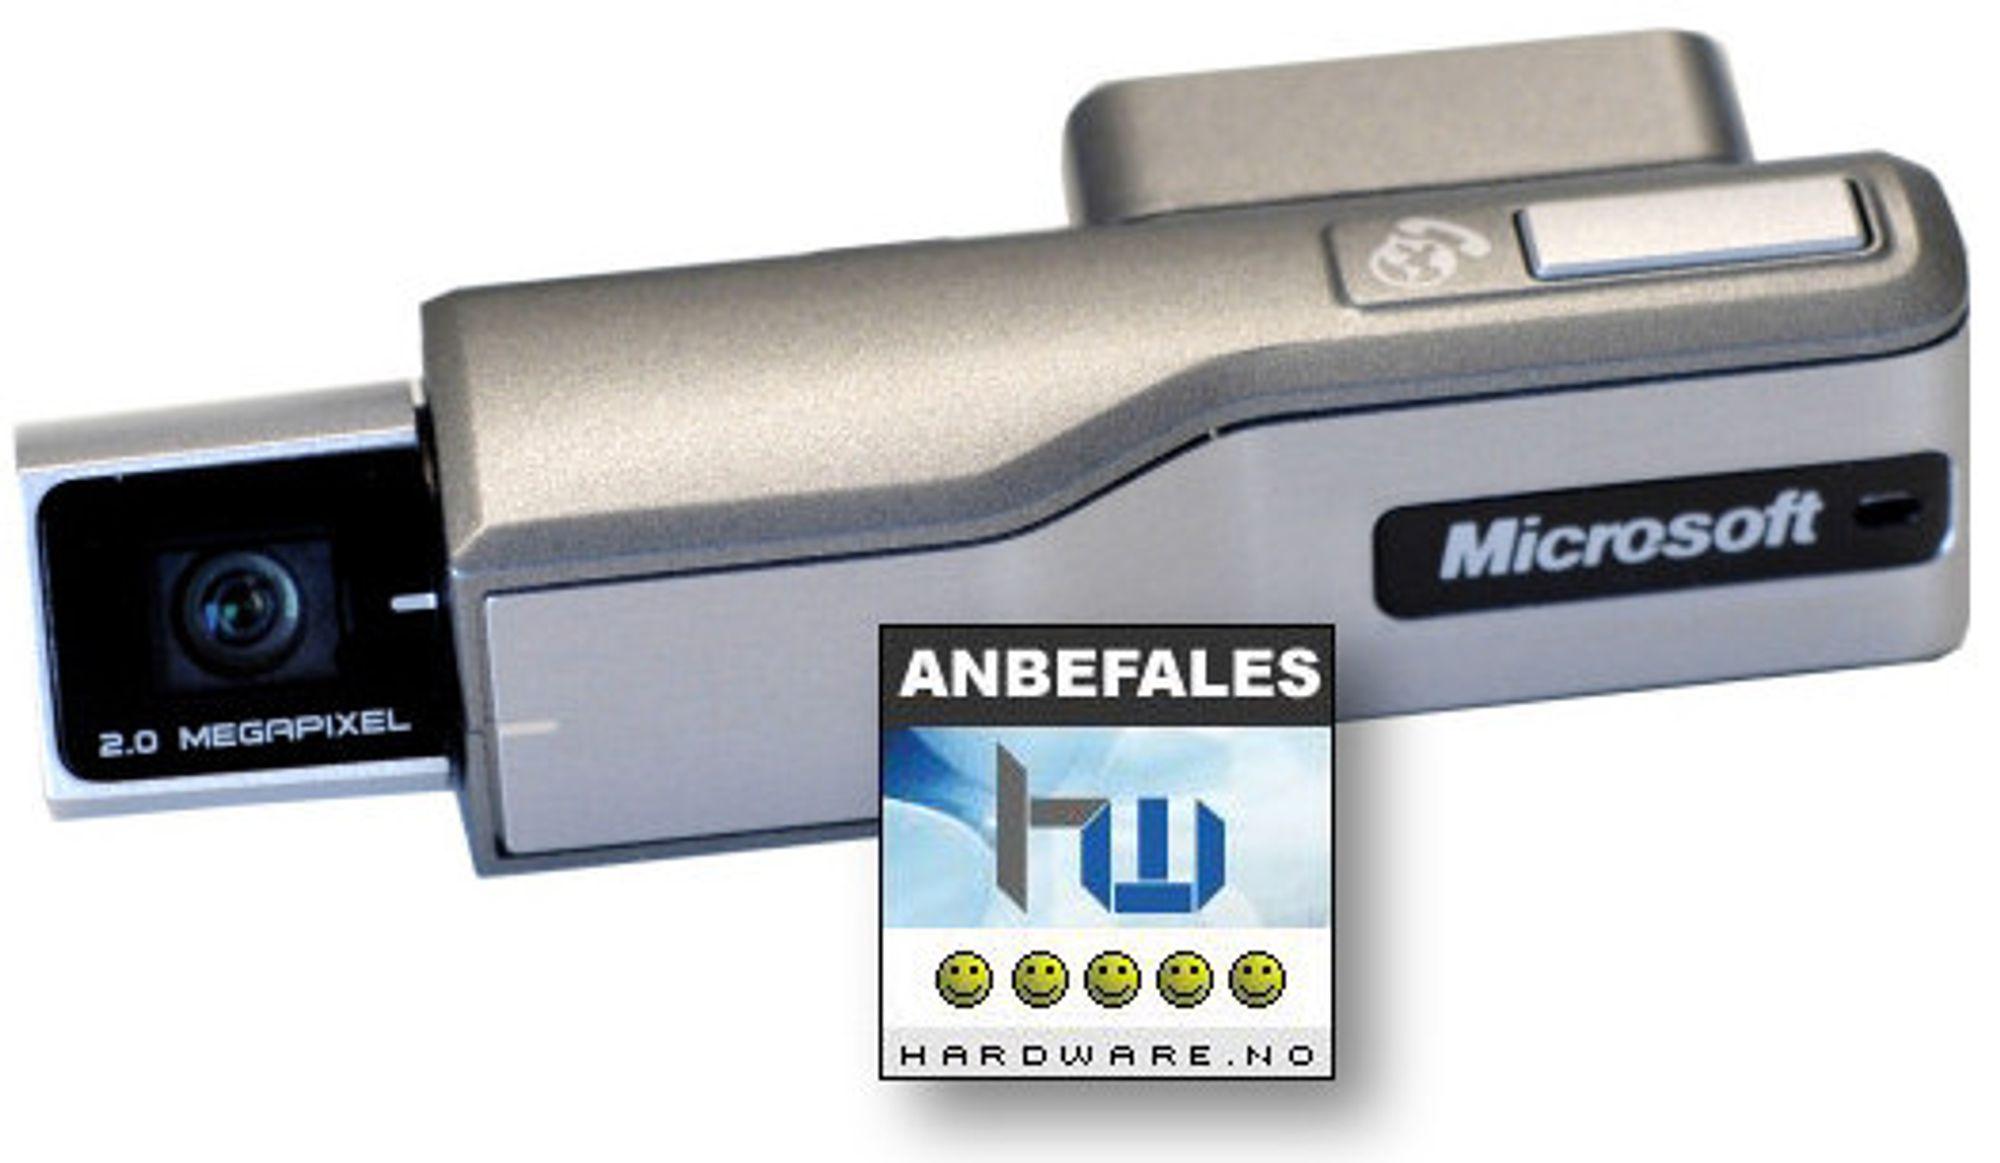 <em>Microsoft NX-6000, Bilde: Chris Erlbeck</em>